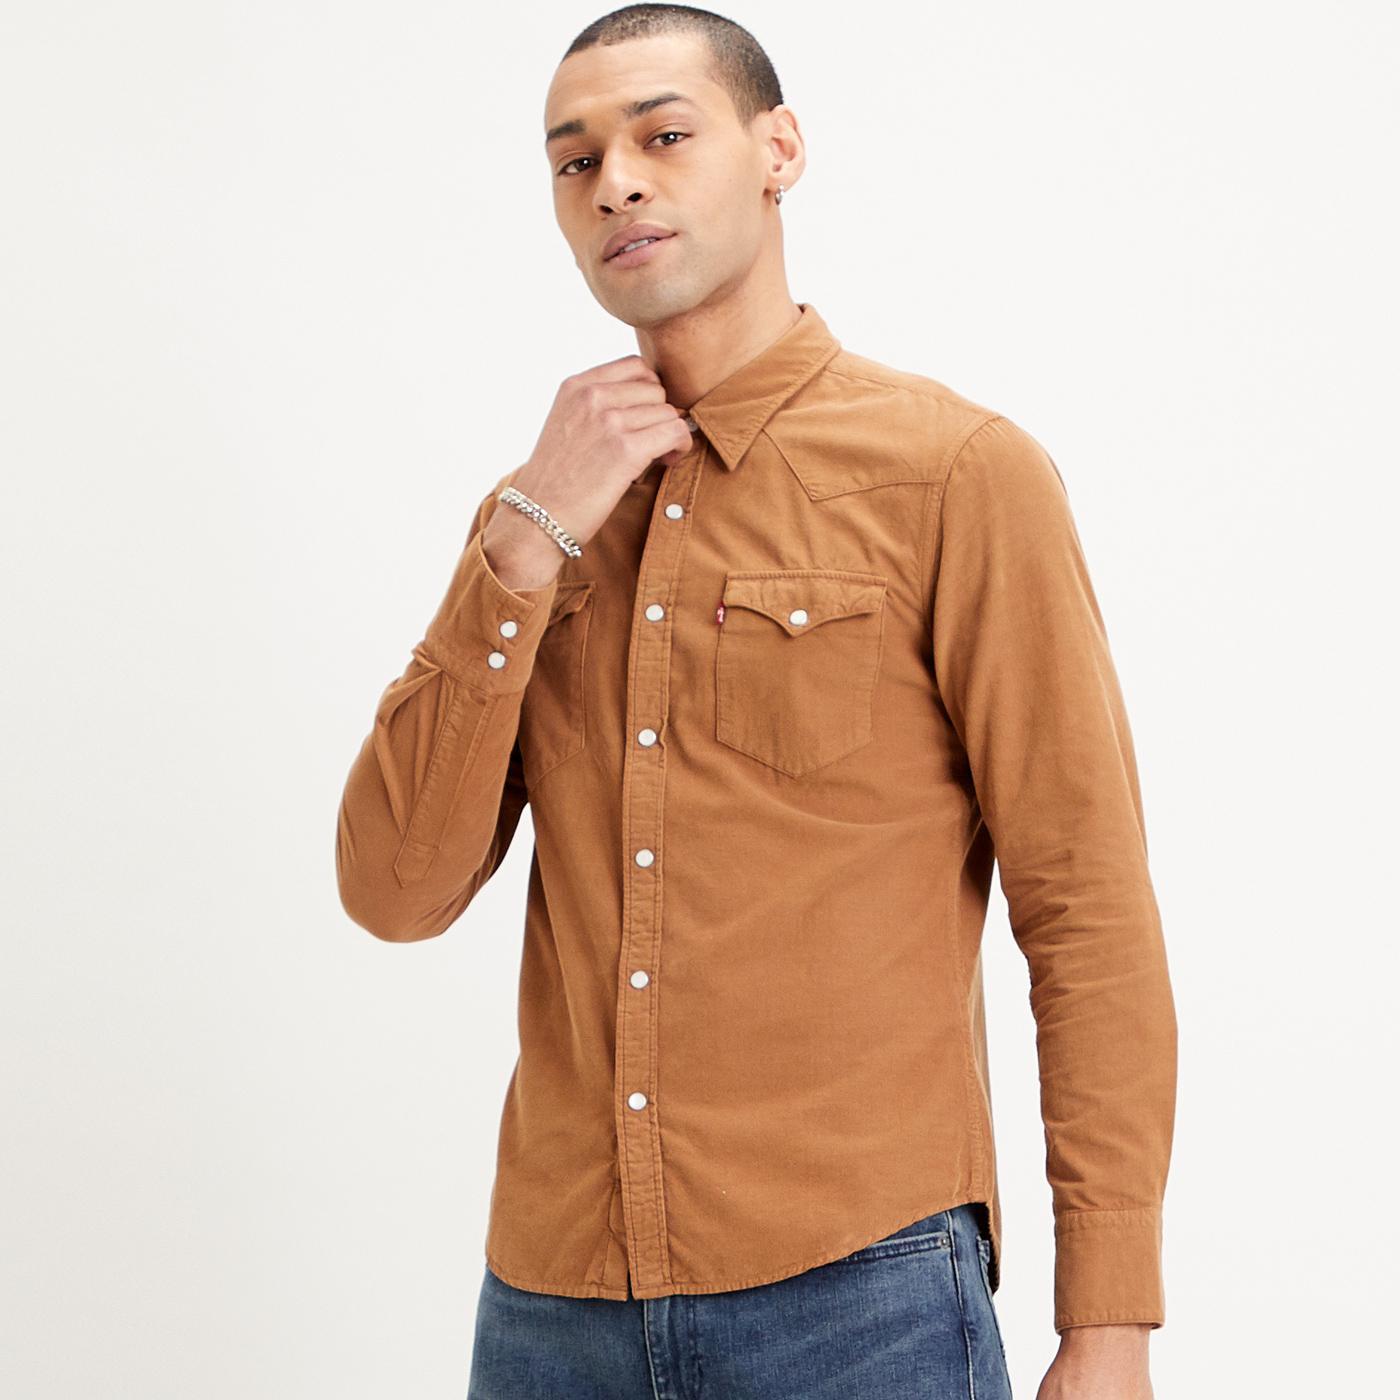 Barstow LEVI'S Retro Western Slim Cord Shirt (C)